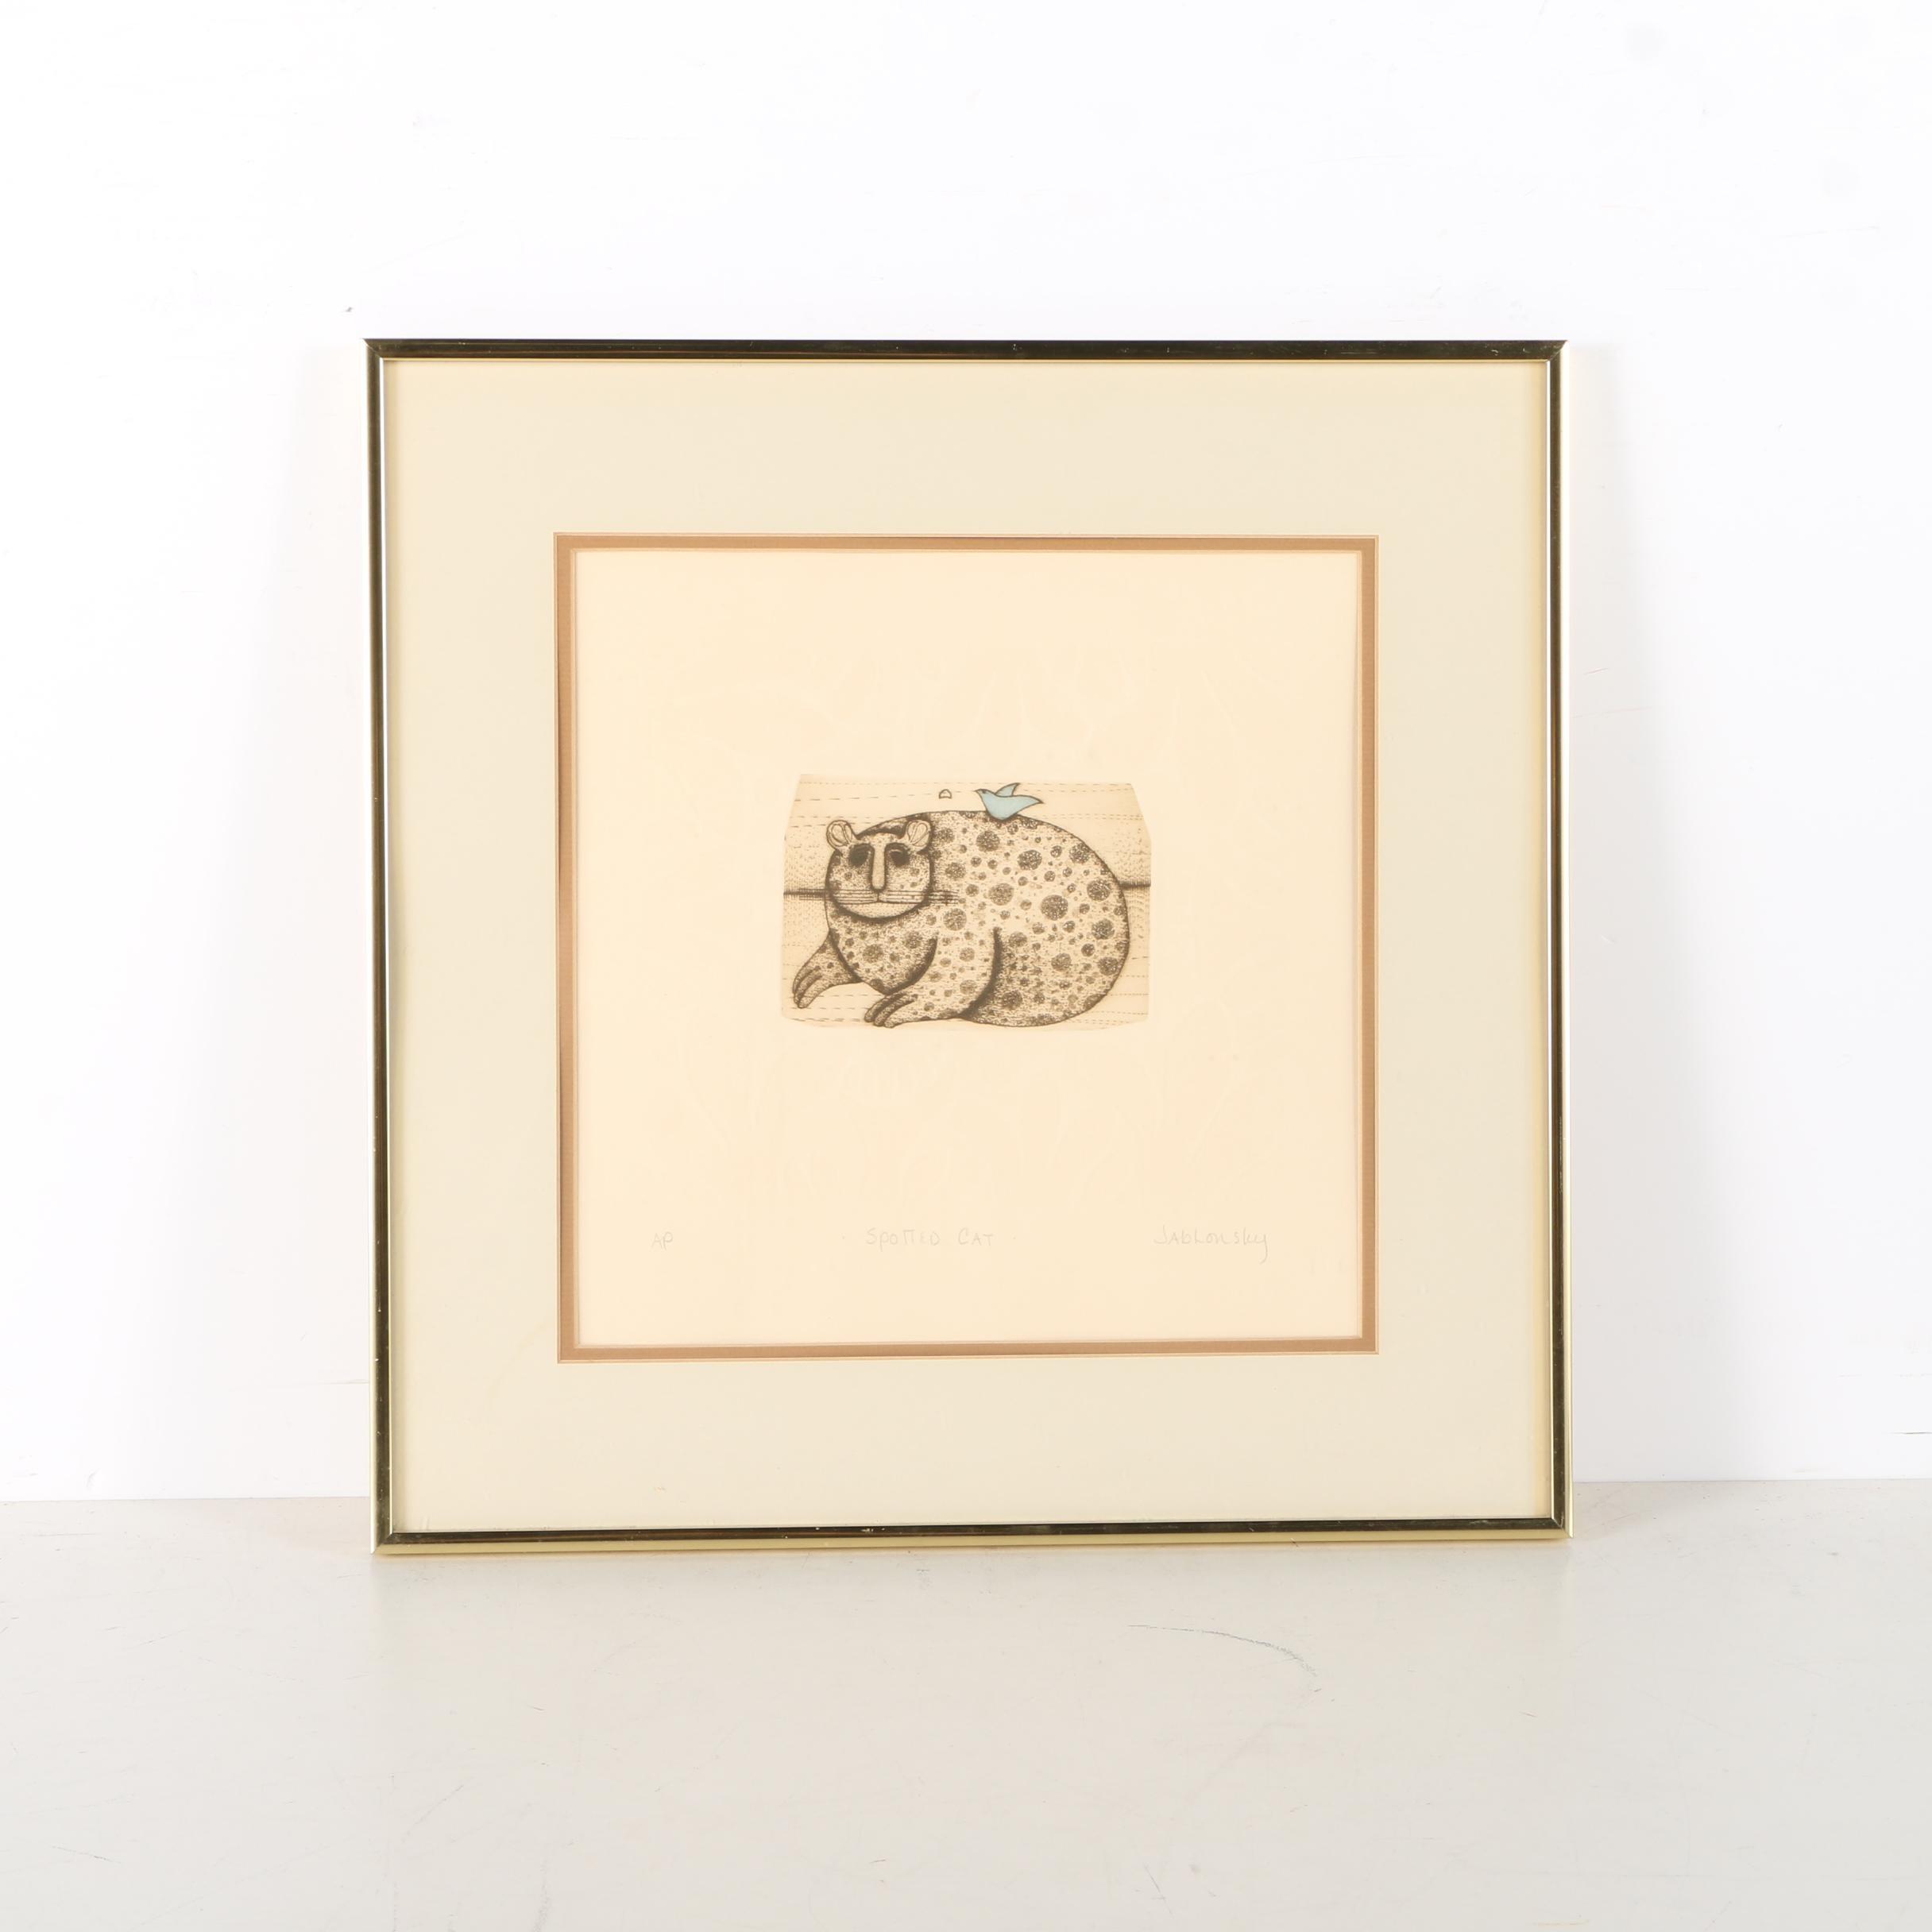 "Carol Jablonsky Artist Proof Embossed Etching ""Spotted Cat"""